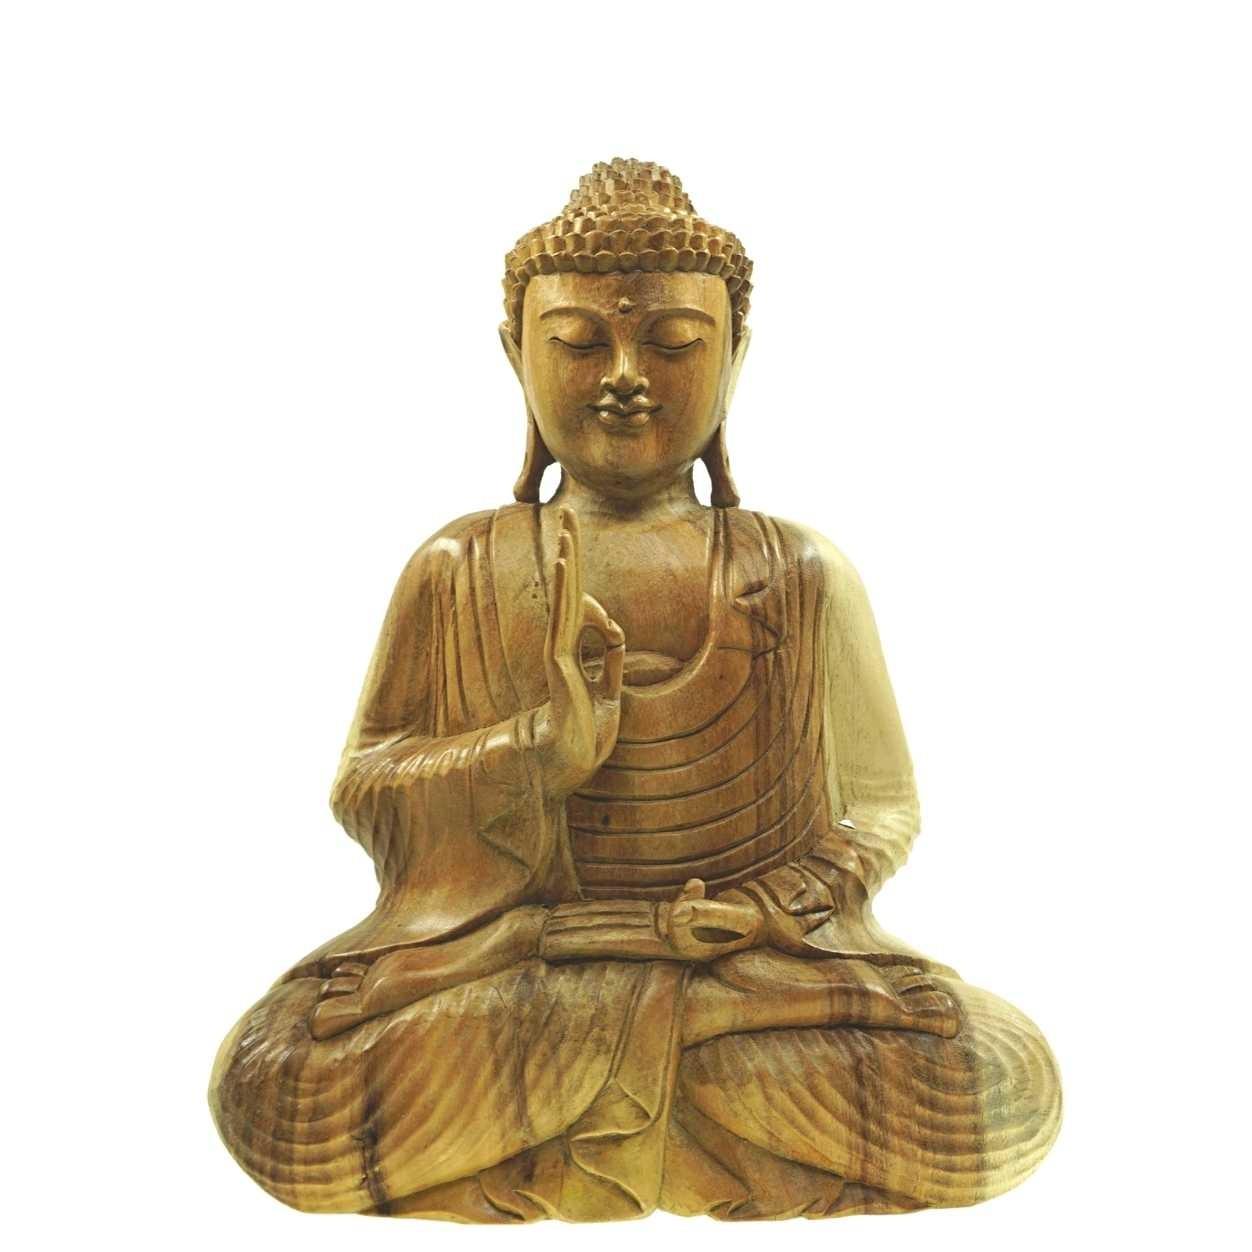 Buddha Masapun 52 cm Natur Suarholz Unikat